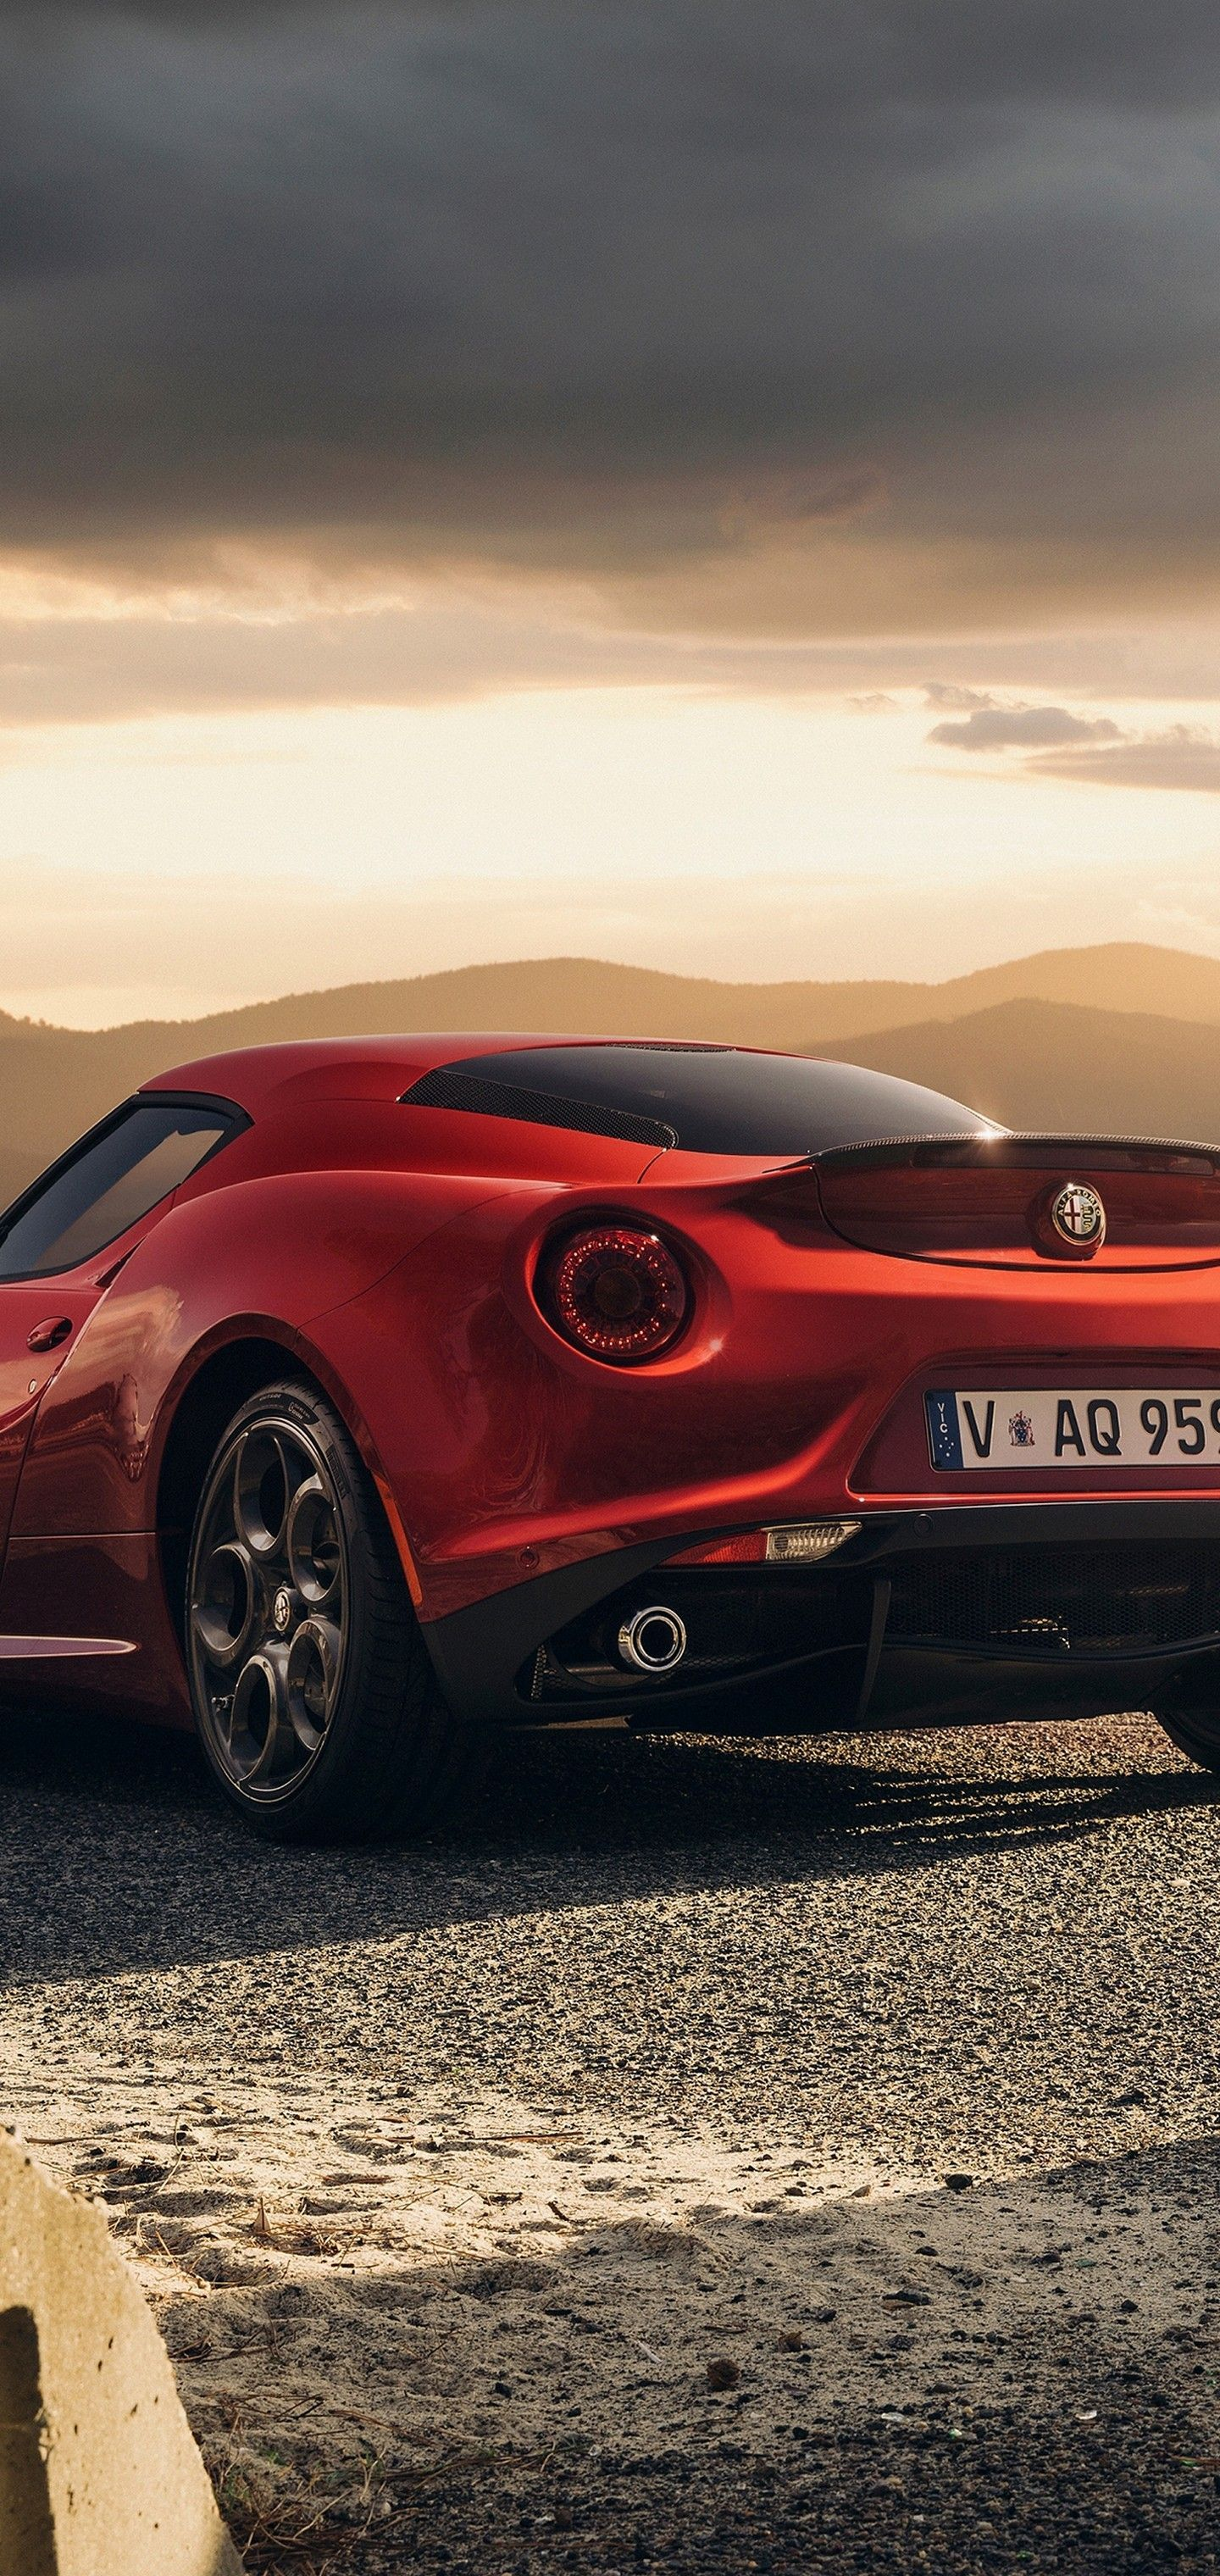 Alfa Romeo 4c Launch Edition Red Wallpaper 1440x3040 In 2020